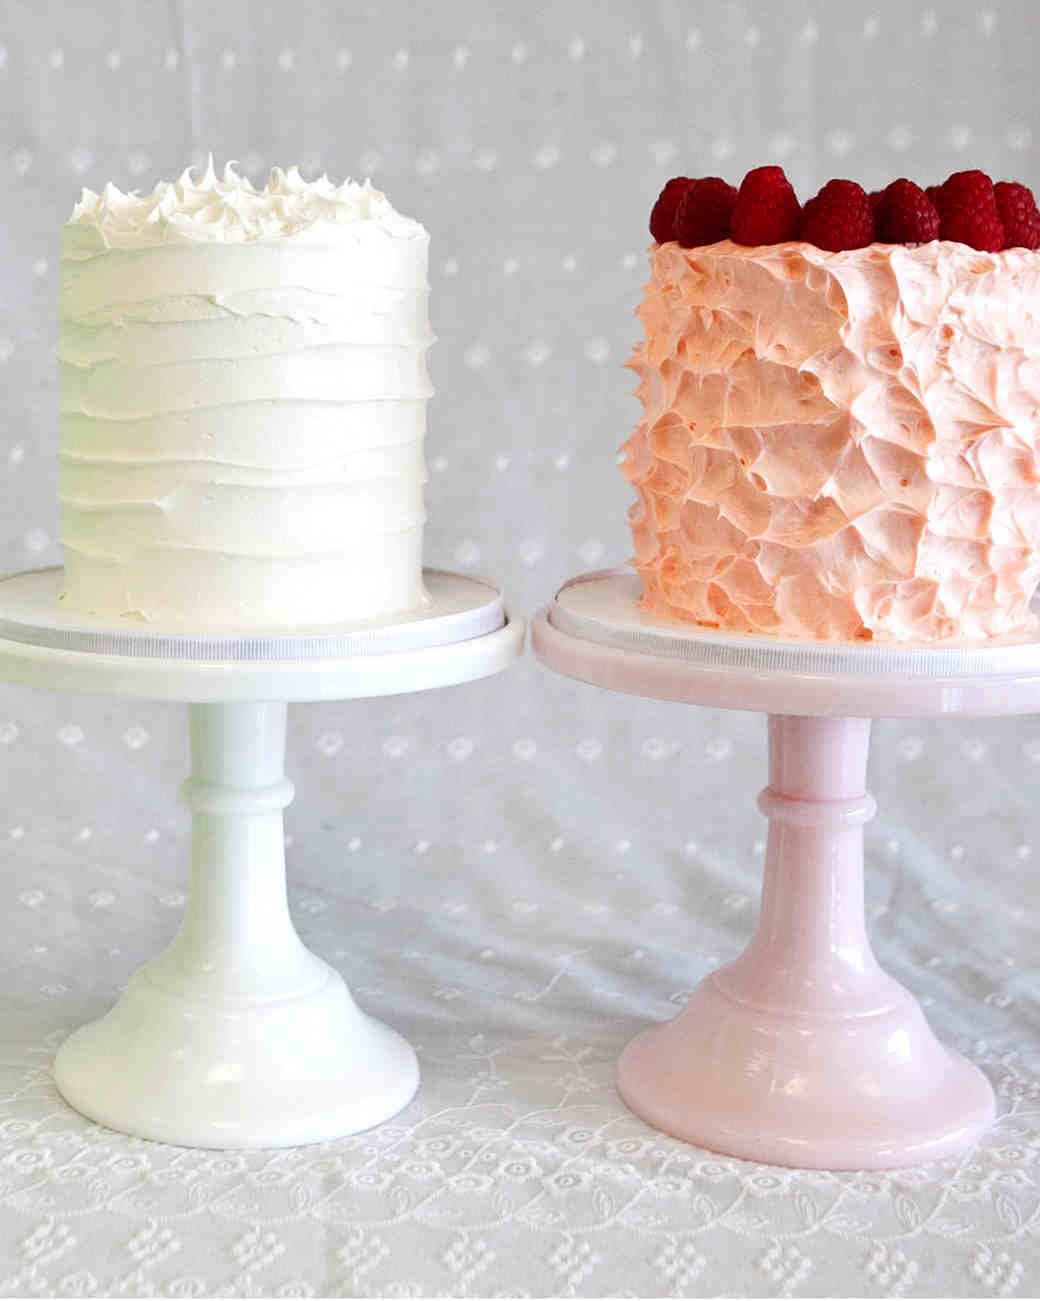 Fullsize Of Wedding Cake Frosting